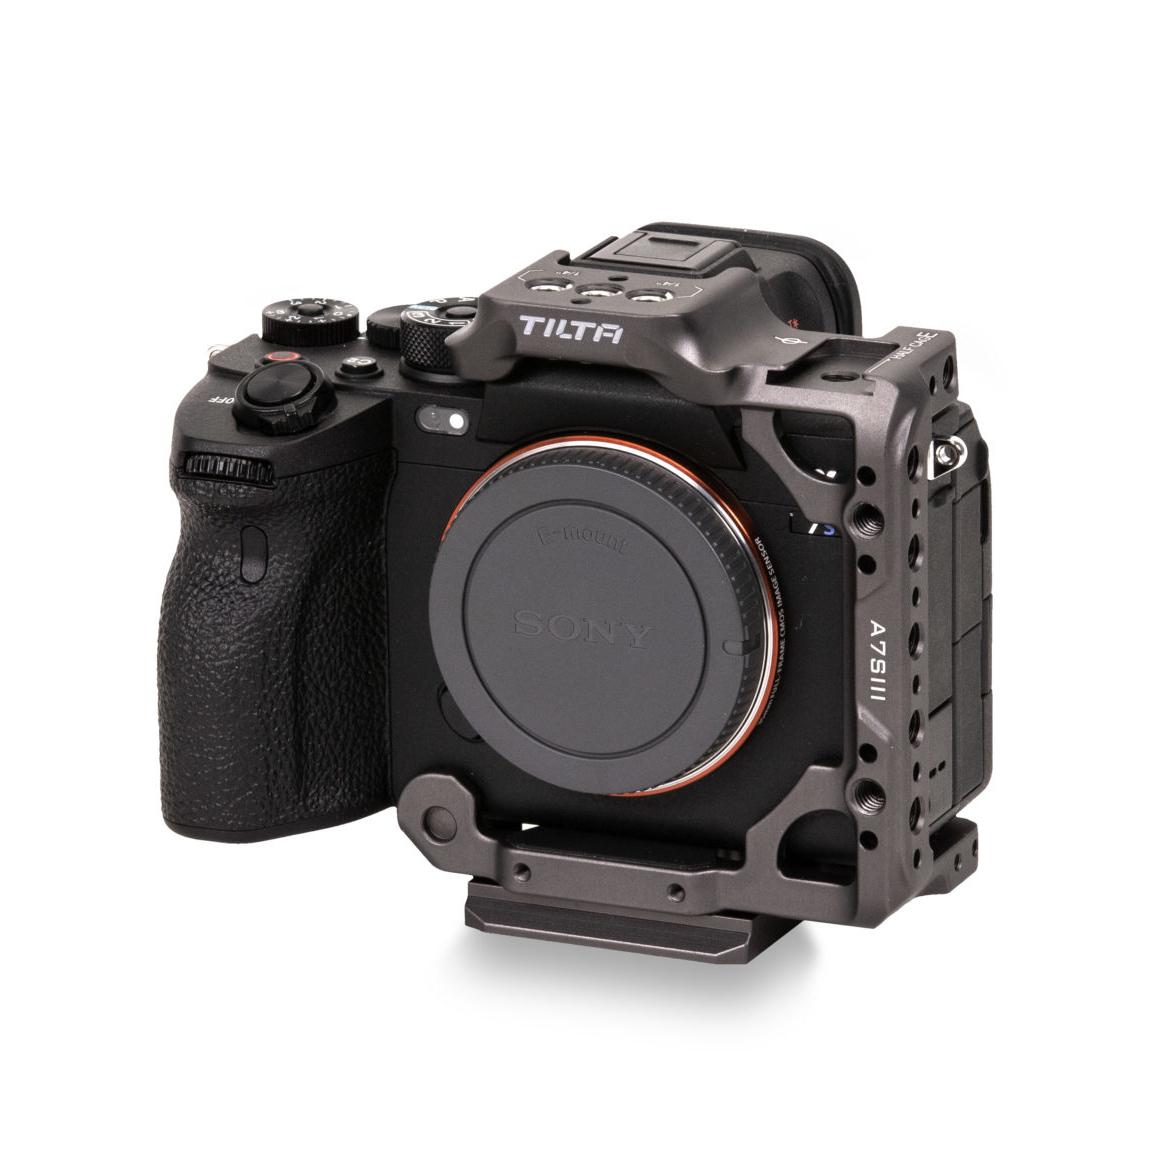 tilta-ta-t18-hcc-g-01-half-camera-cage-p%C3%B3%C5%82-klatka-operatorska.jpg